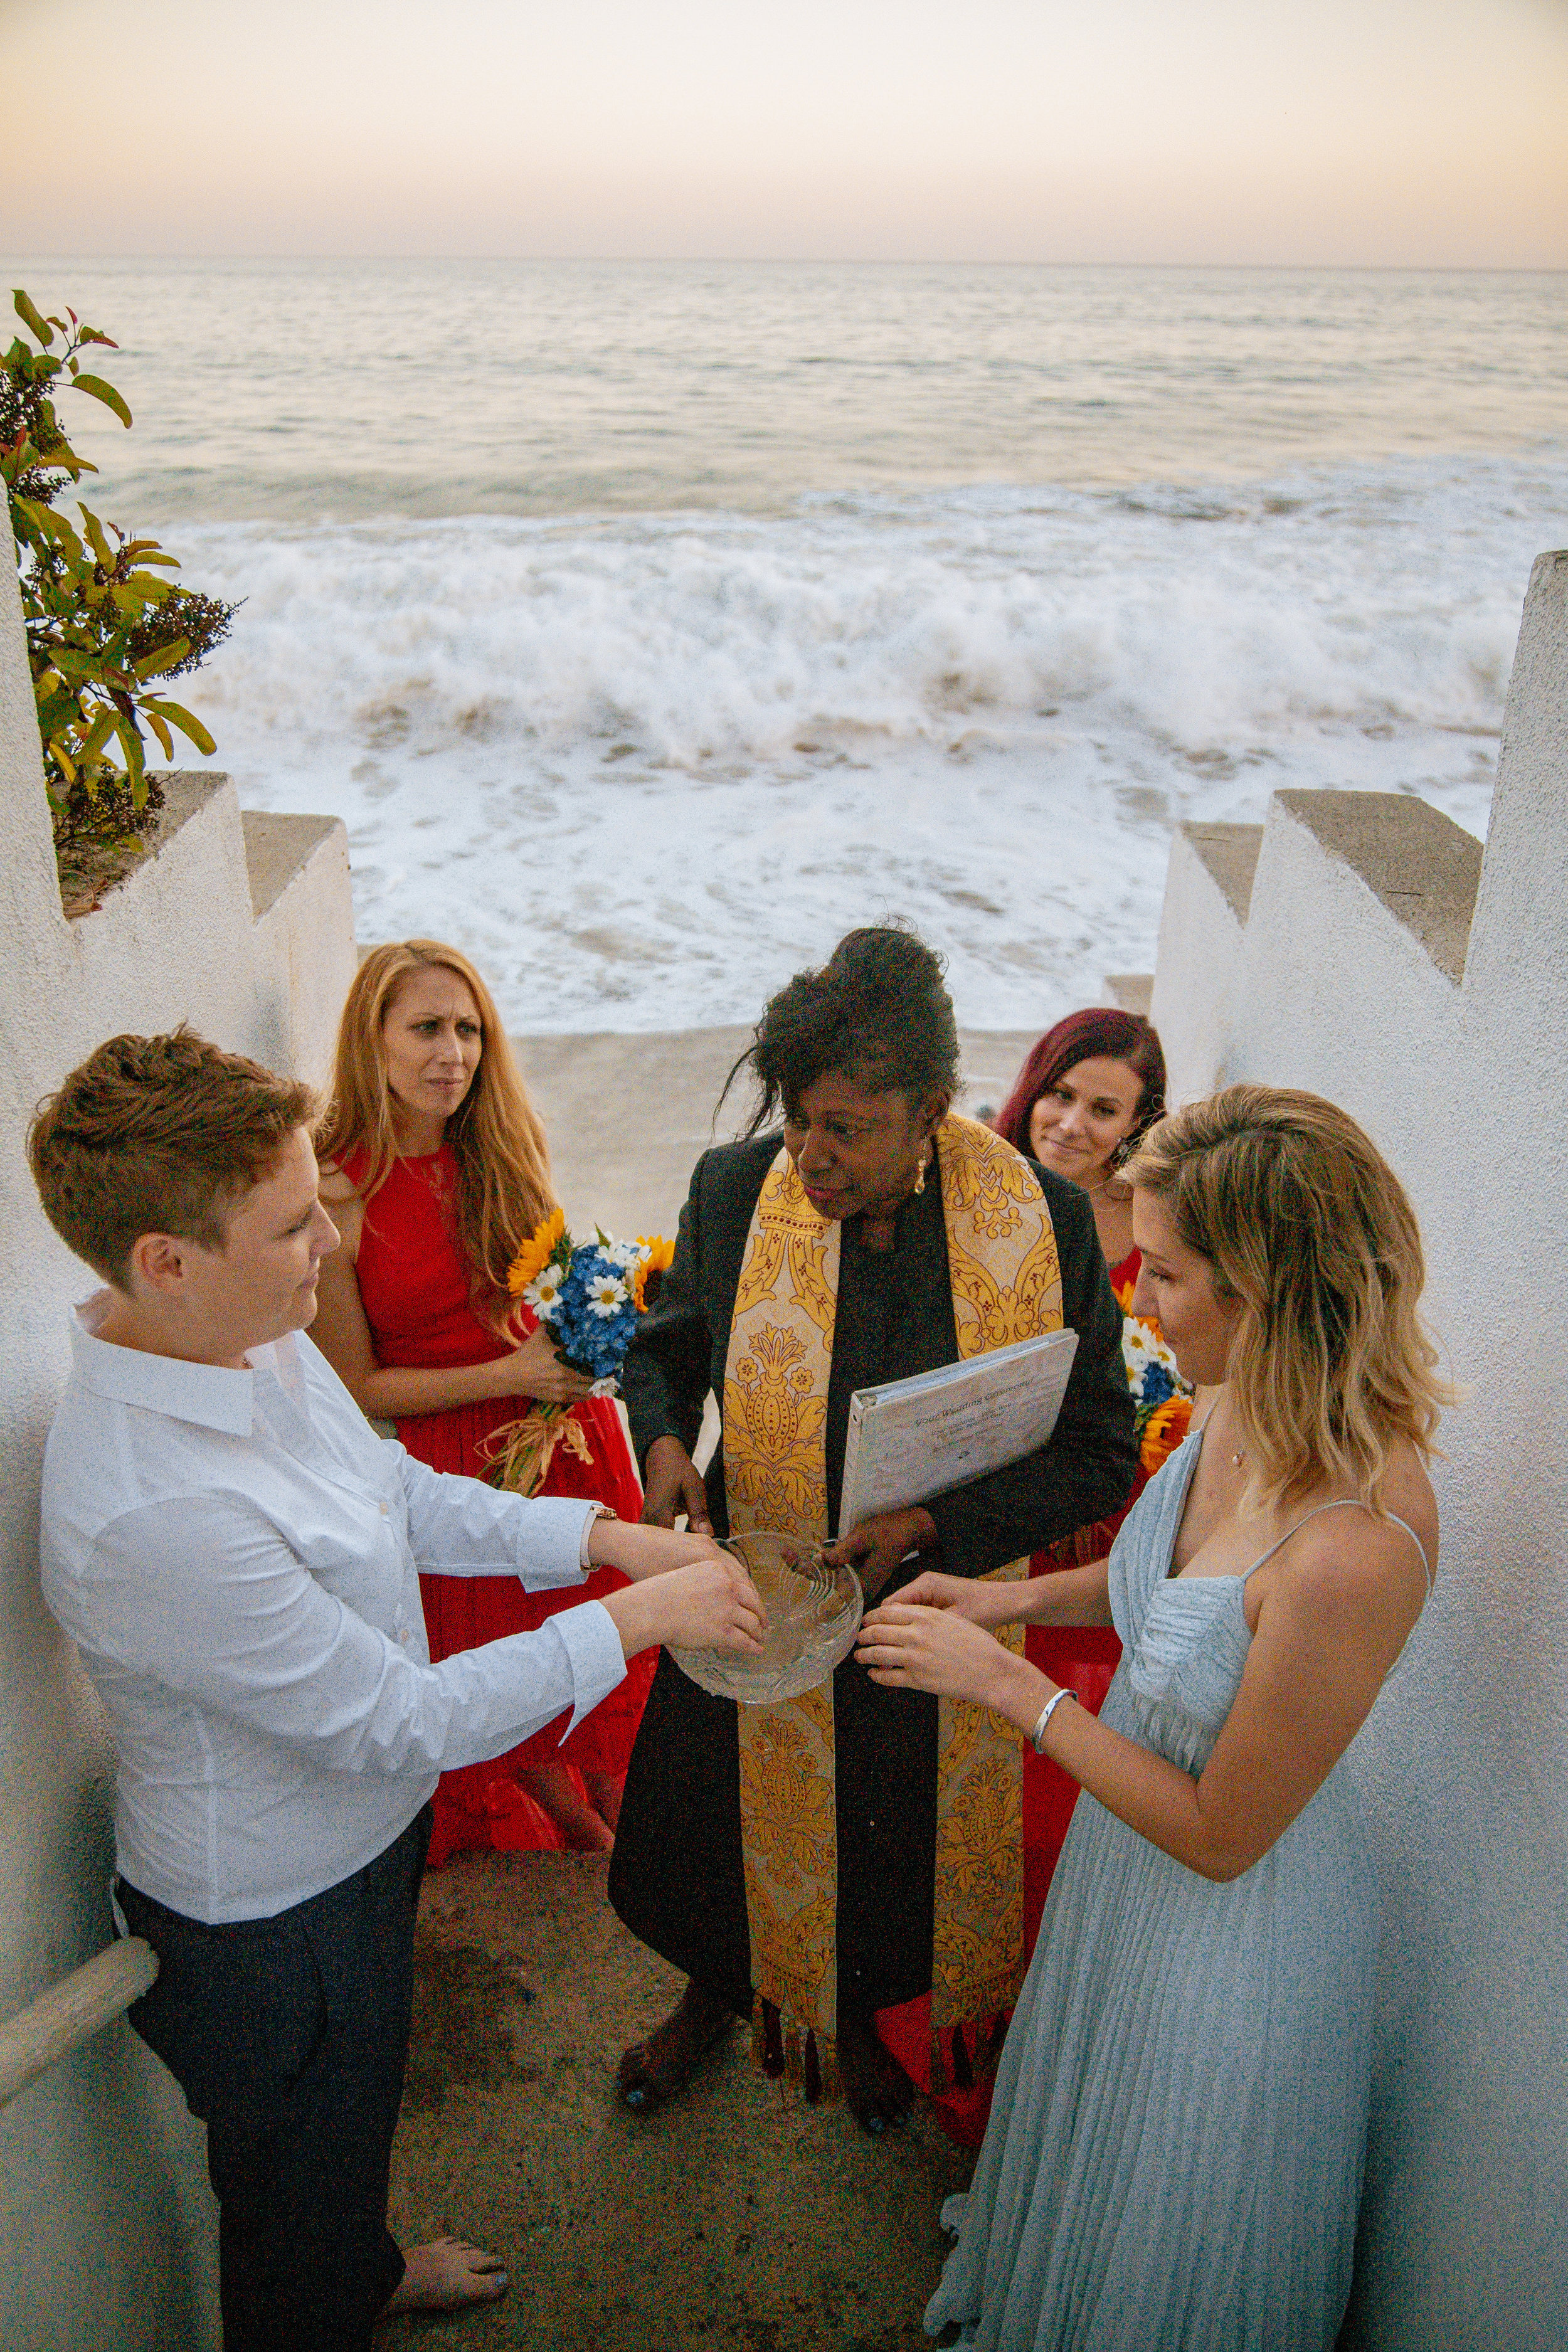 Hannah_&_Kates_Wedding_Oct_5th_2018_0_49.JPG